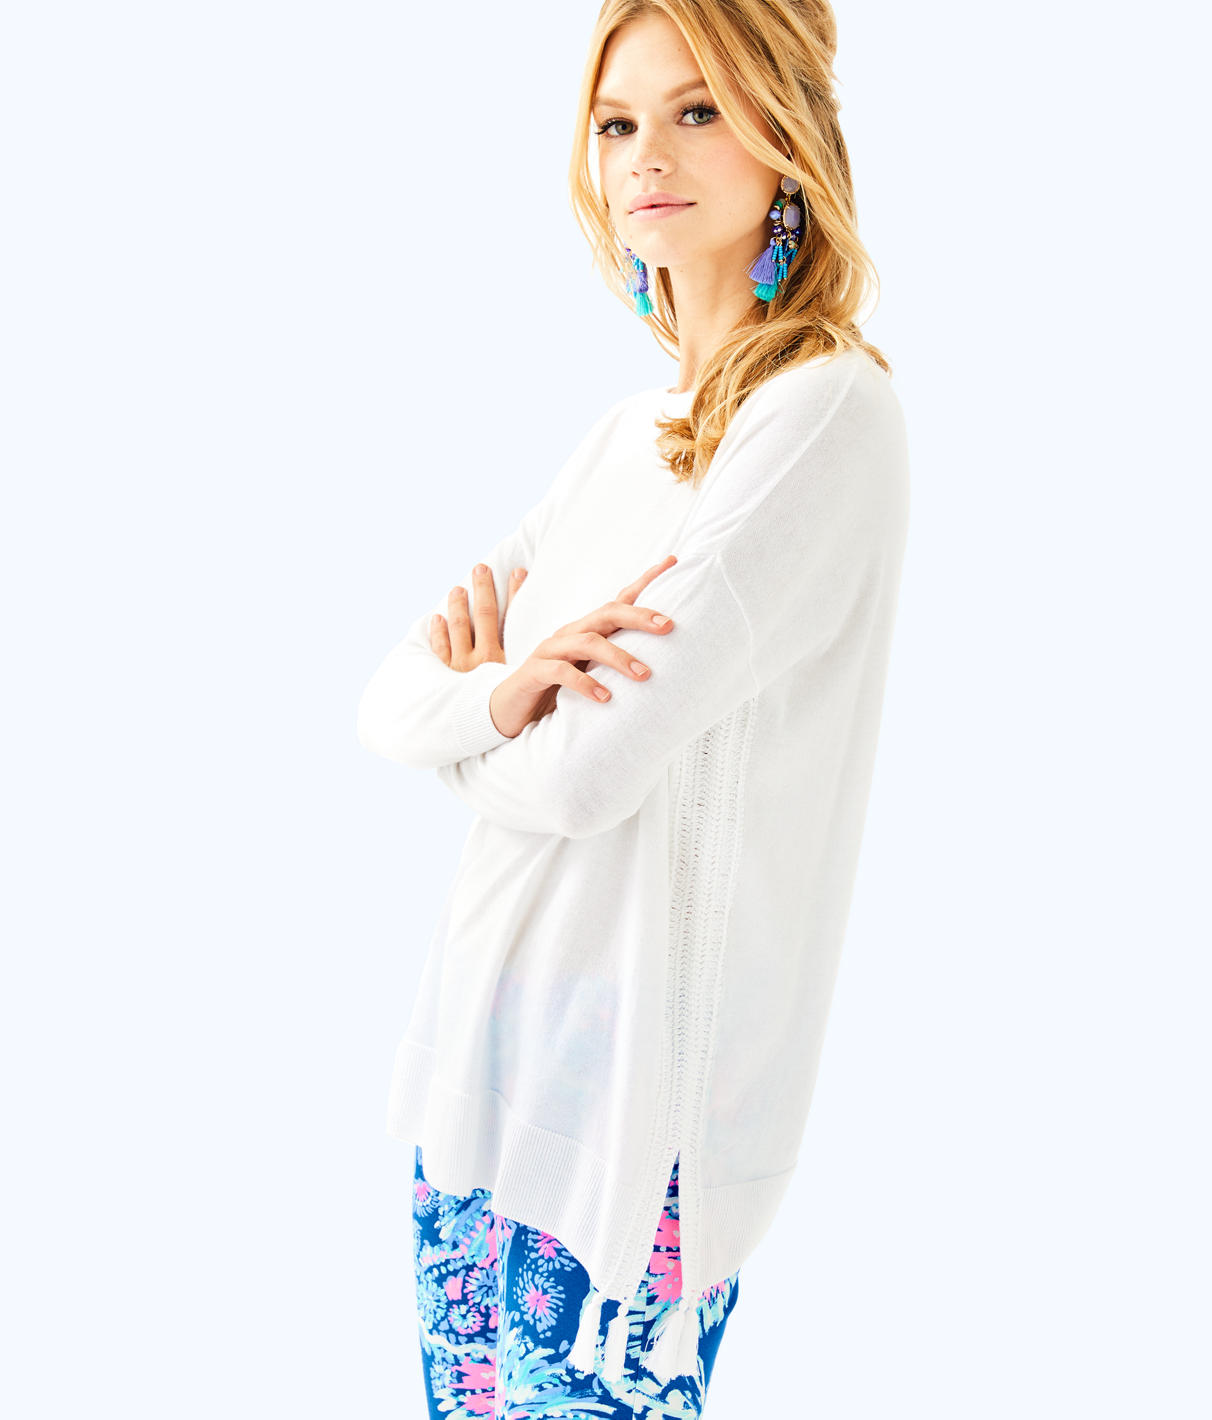 Lilly Pulitzer Lilly Pulitzer Womens Damara Sweater